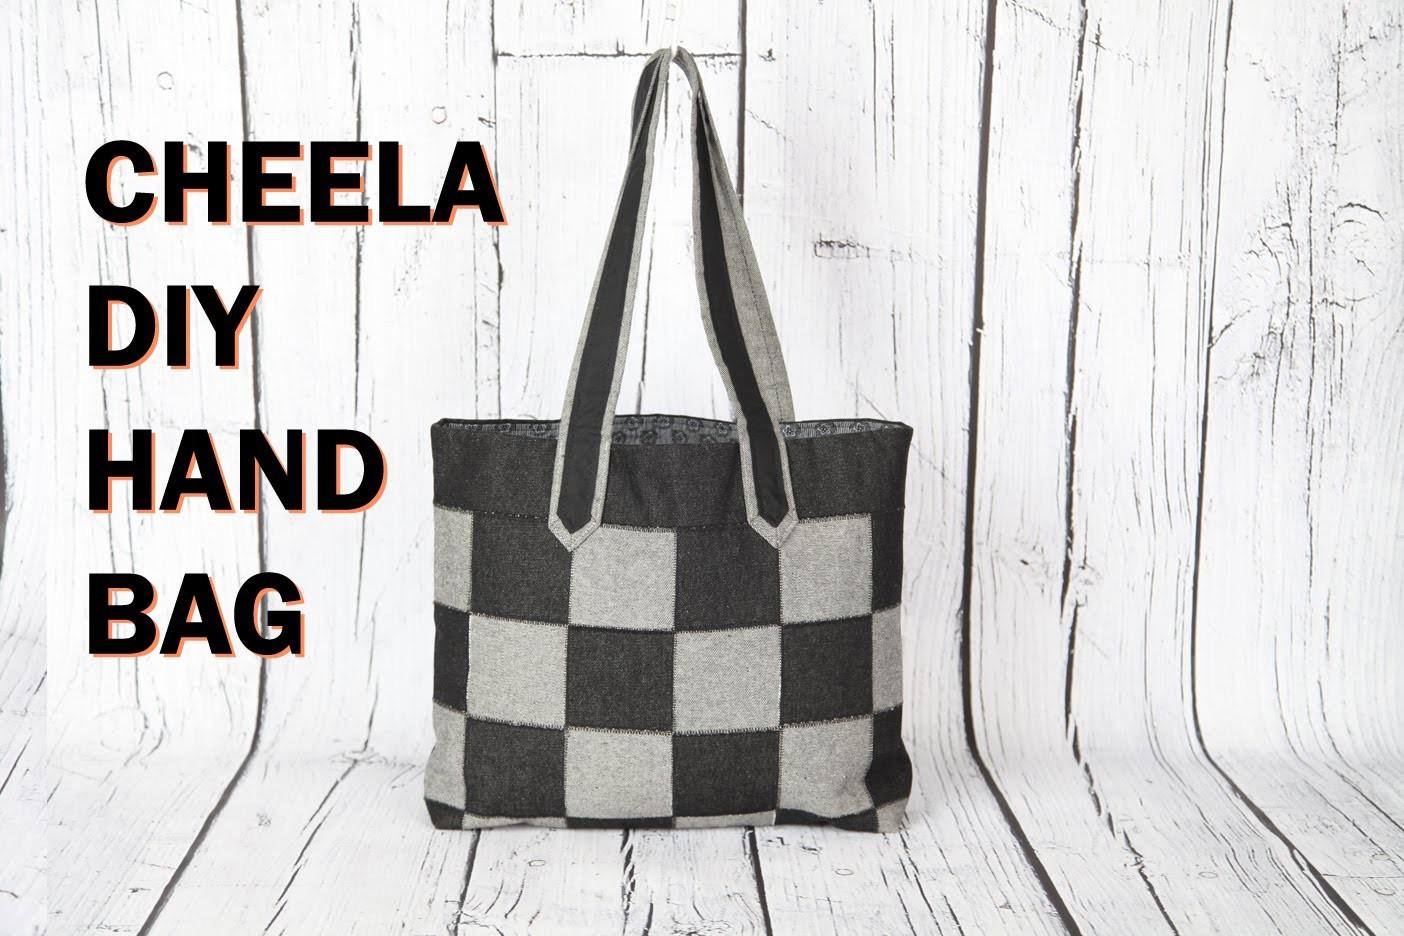 Cheela 4. flat patch work tote bag with zip pocket.DIY Bag Vol 22